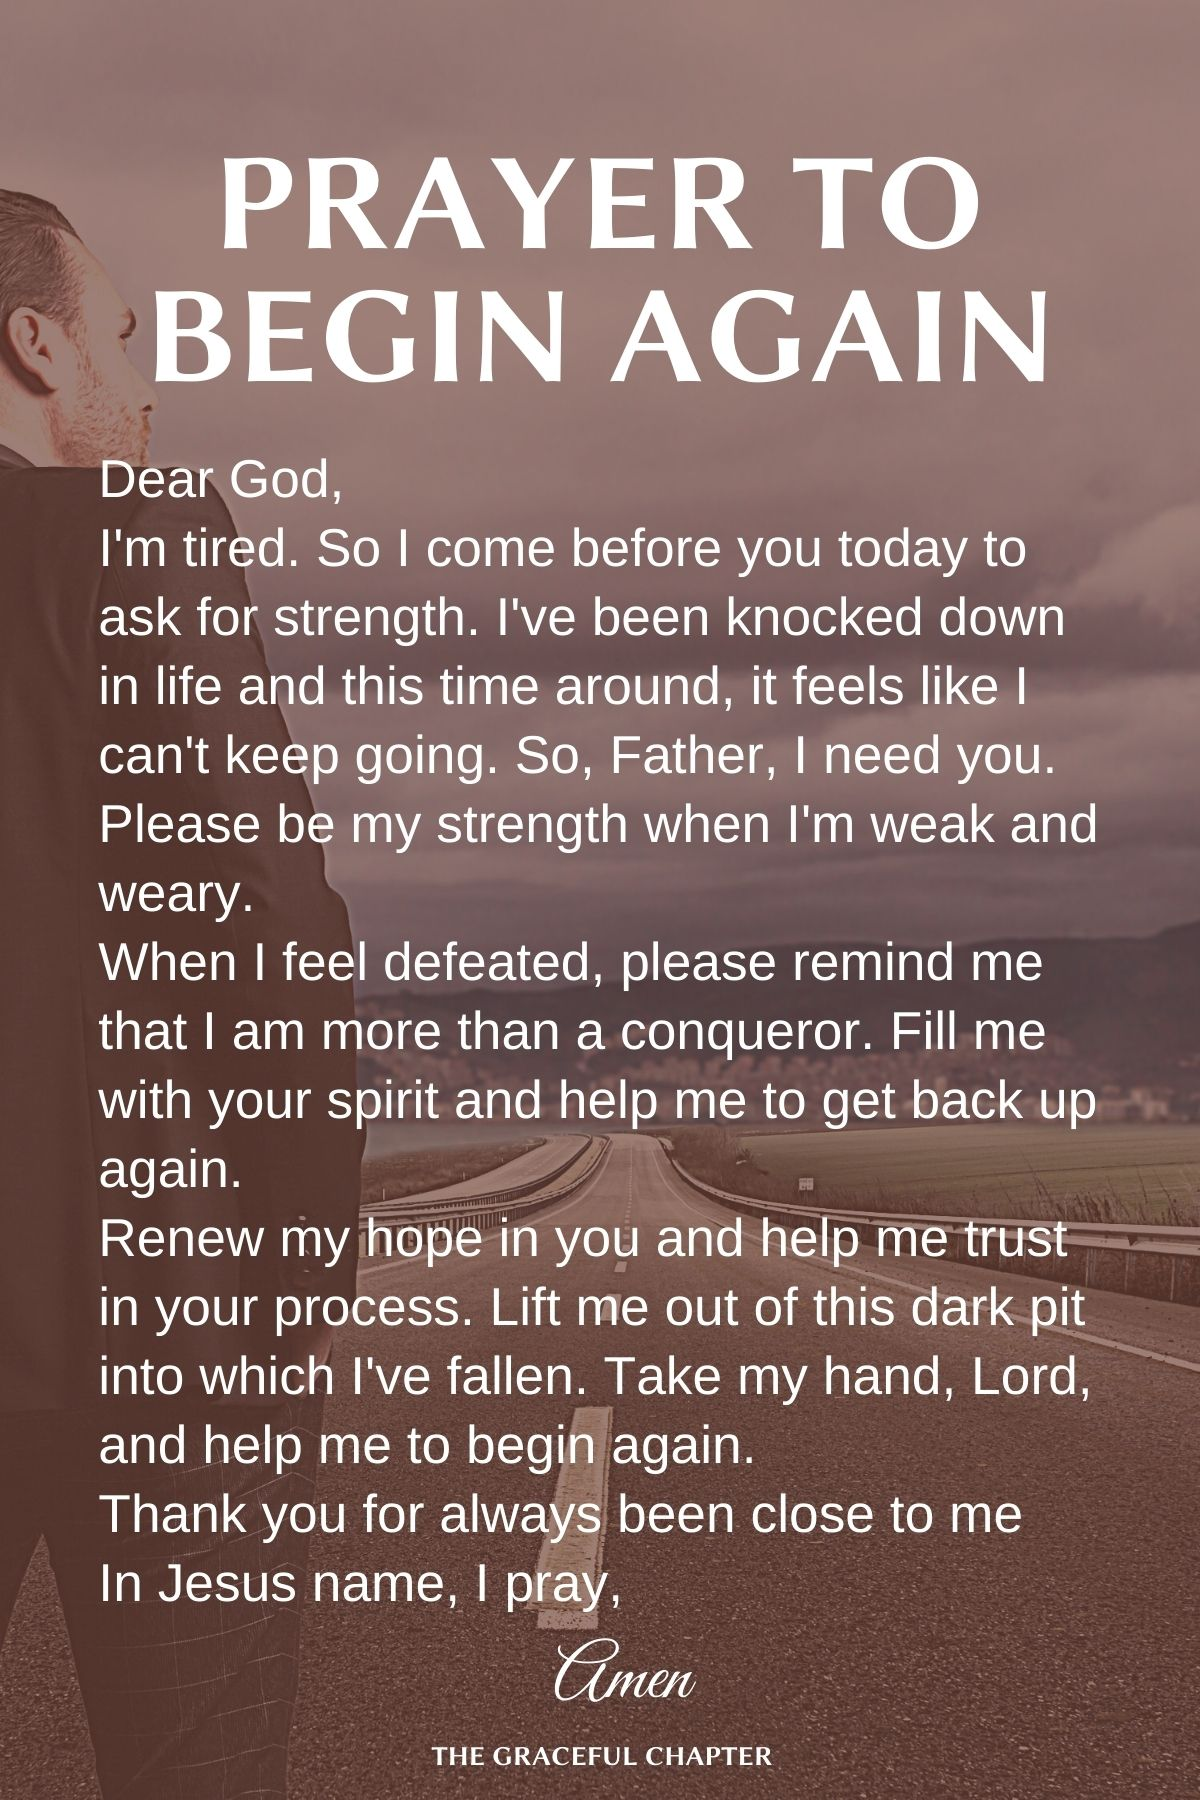 Prayer to begin again